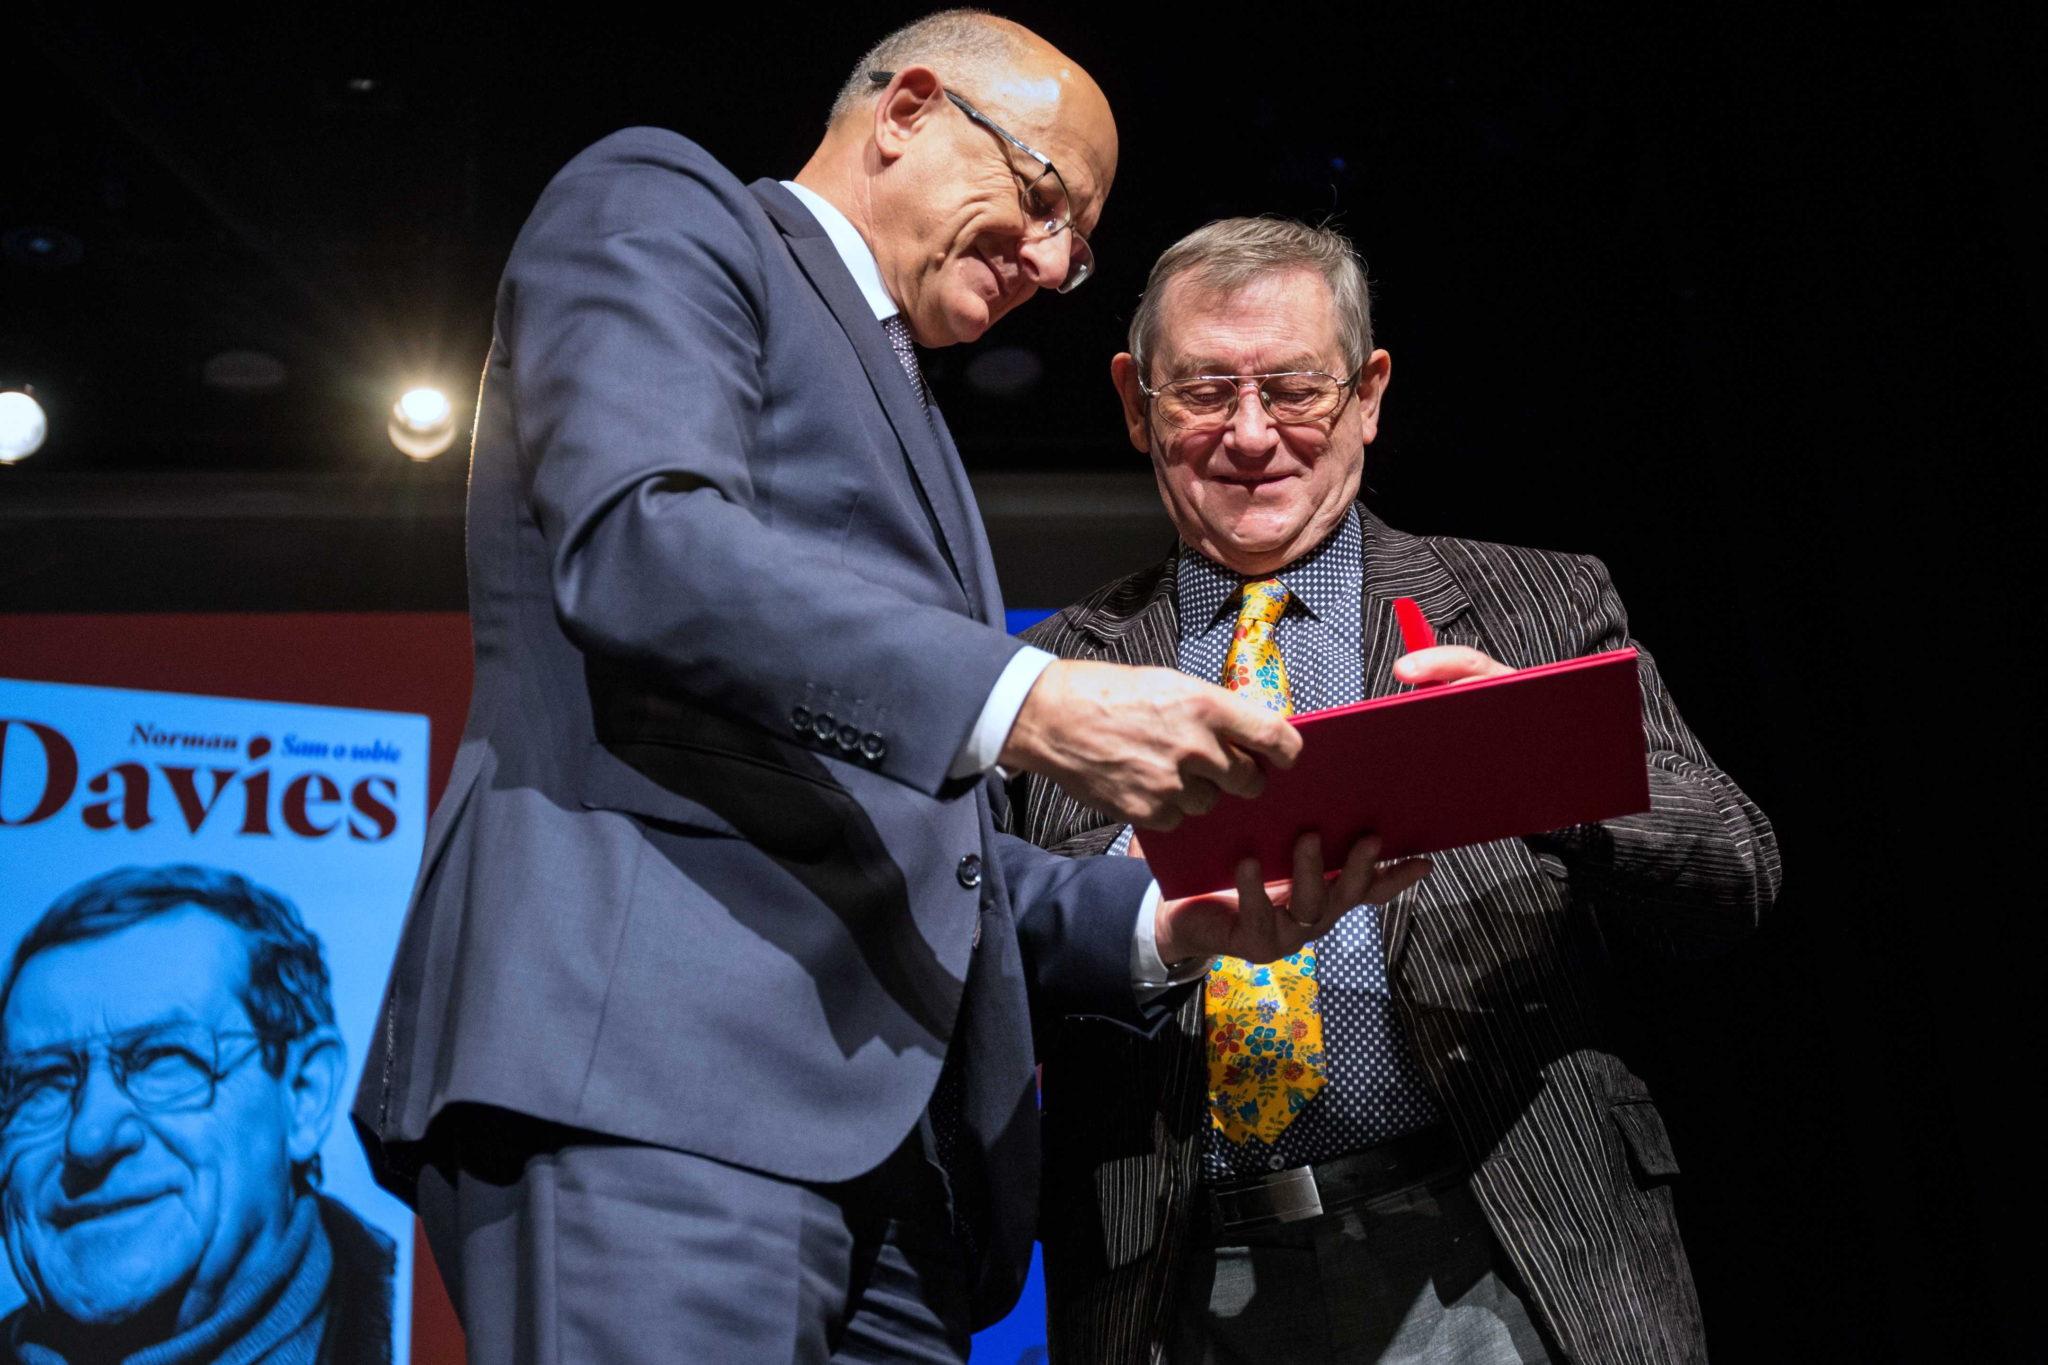 Polska: Znany historyk Norman Davies odebrał dziś medal